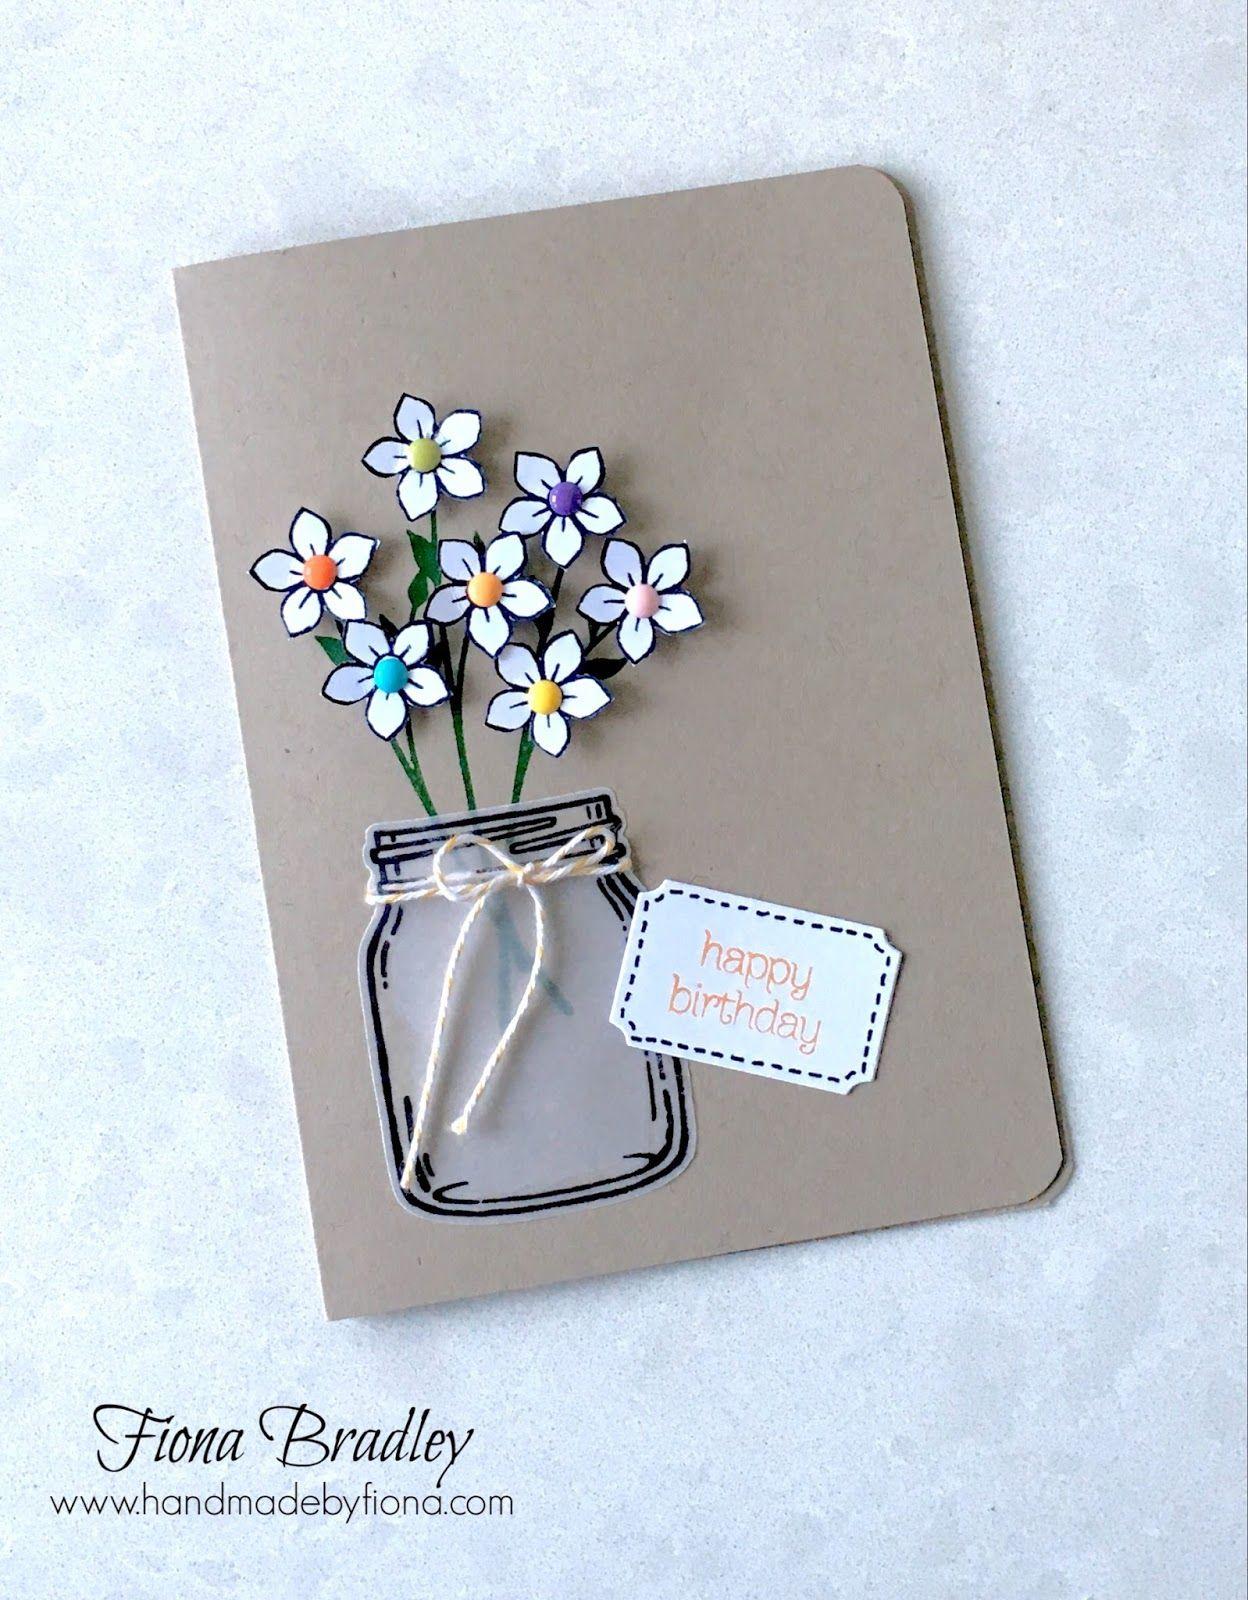 20 Awesome Homemade Birthday Card Ideas Crafty Club Diy Craft Ideas Cool Birthday Cards Birthday Cards For Boyfriend Birthday Cards For Girlfriend